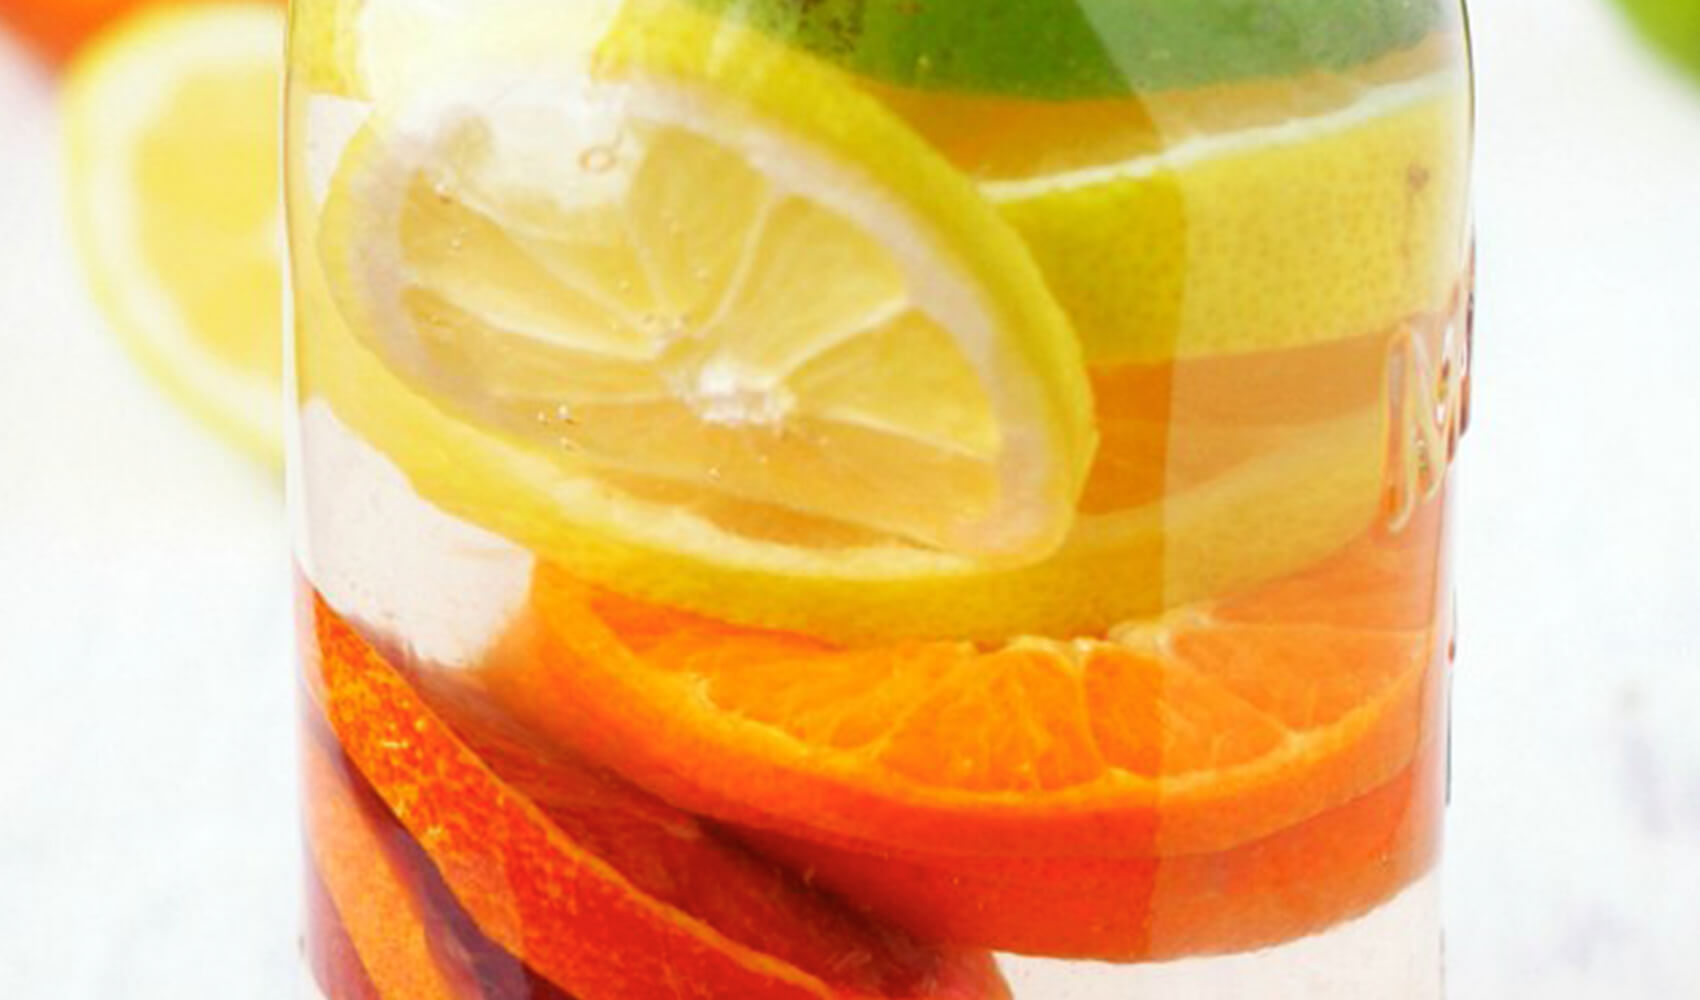 Rainbow Citrus Infused Water